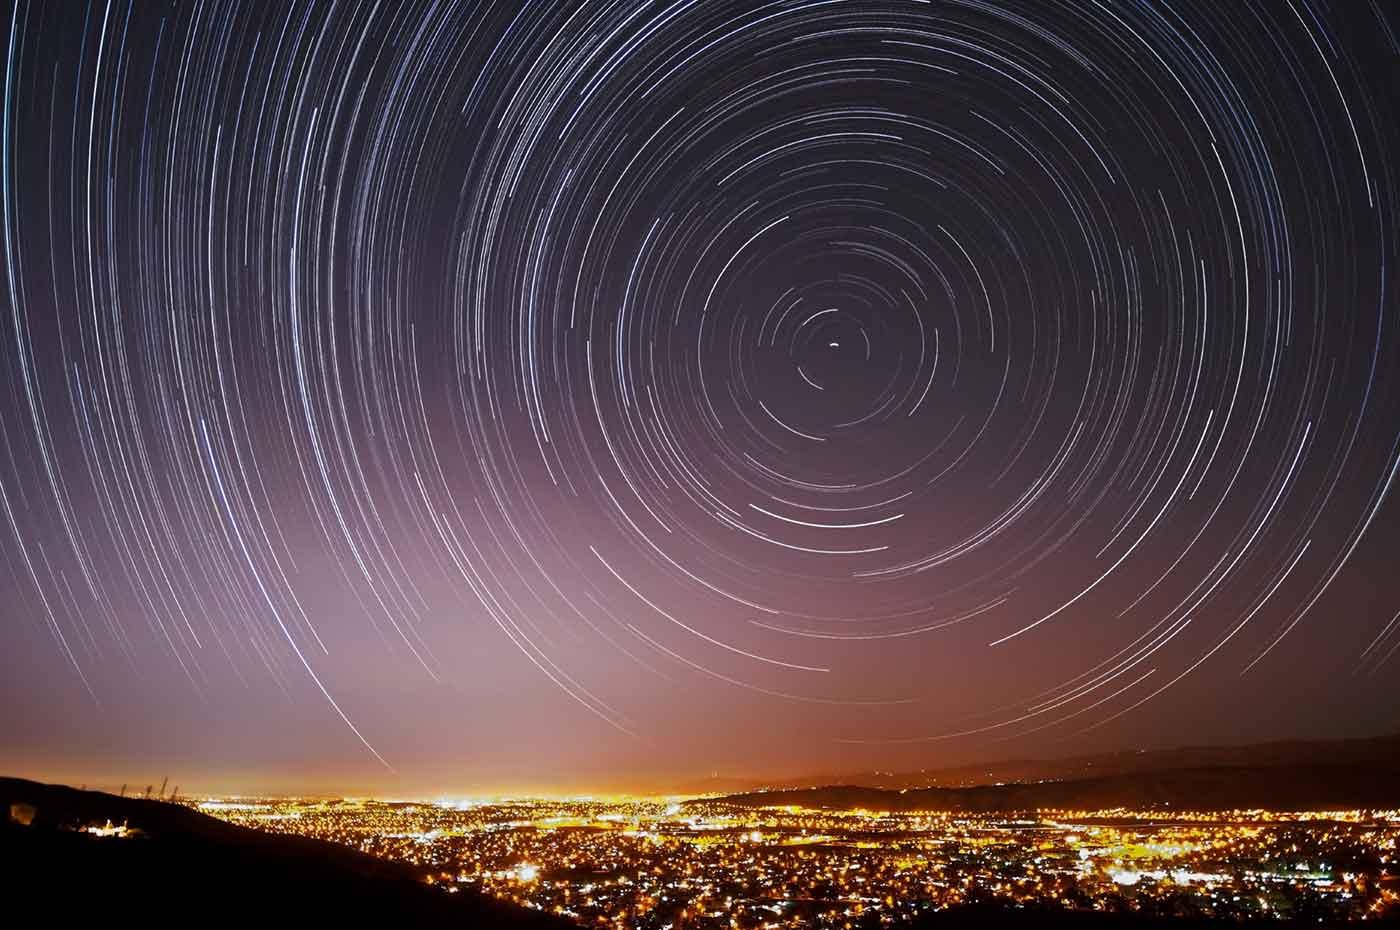 Night sky with swirling stars - Velocity in Santa Clara 2016